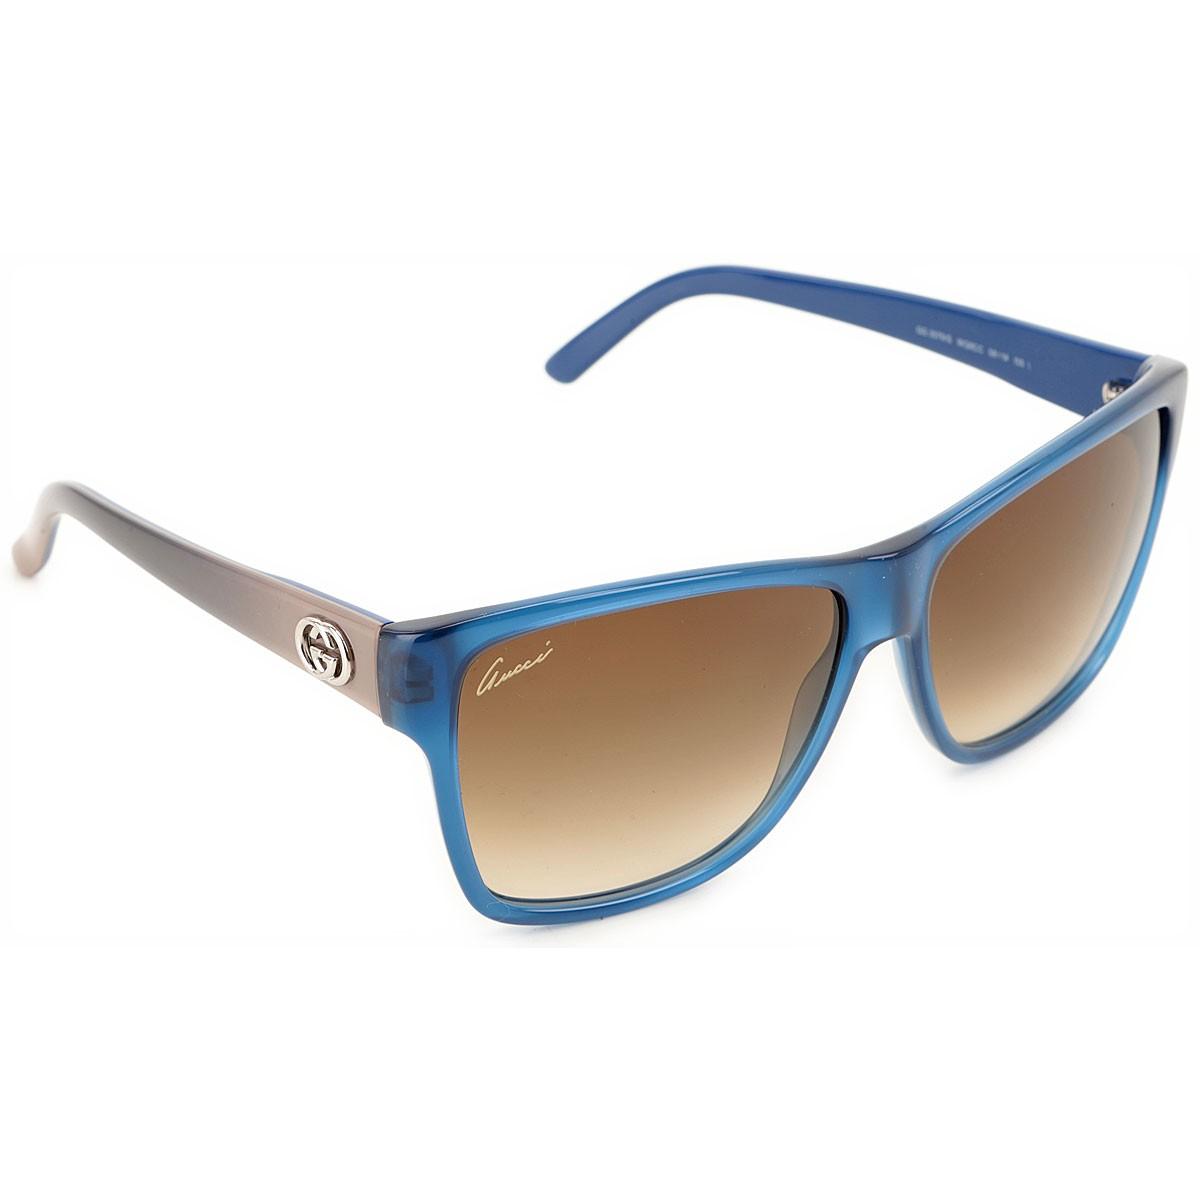 cb8acb12c4 Γυαλιά Ηλίου Gucci GG 3579 S WQ8CC